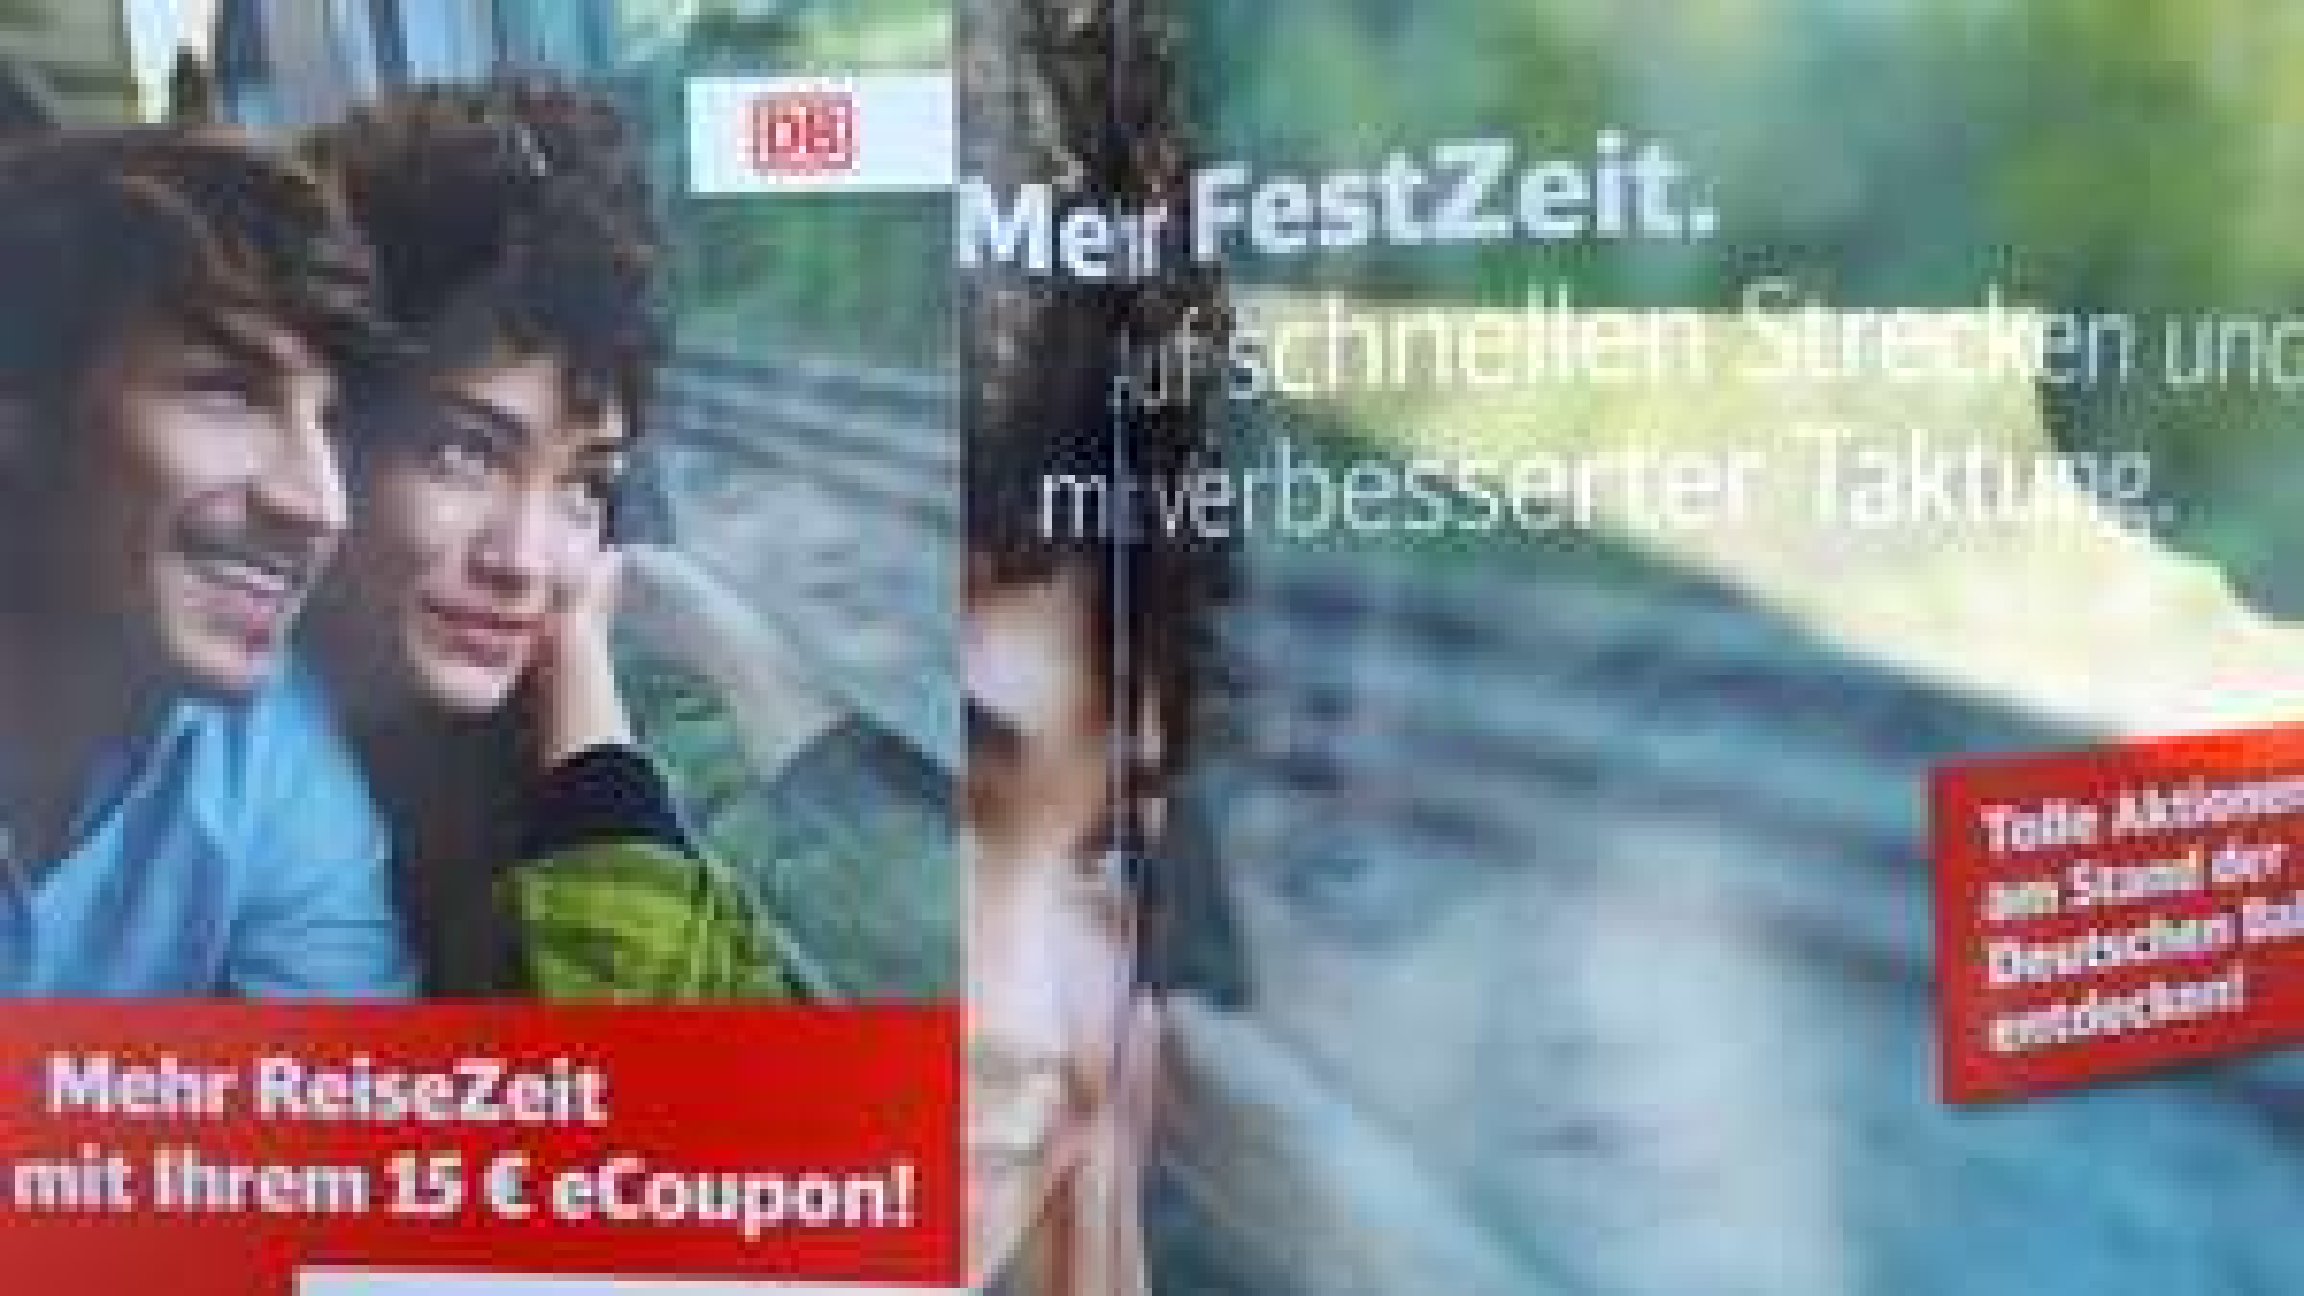 [Lokal Das Fest Karlsruhe] 15€ DB-eCoupon ab 49€ MBW zum Mitnehmen